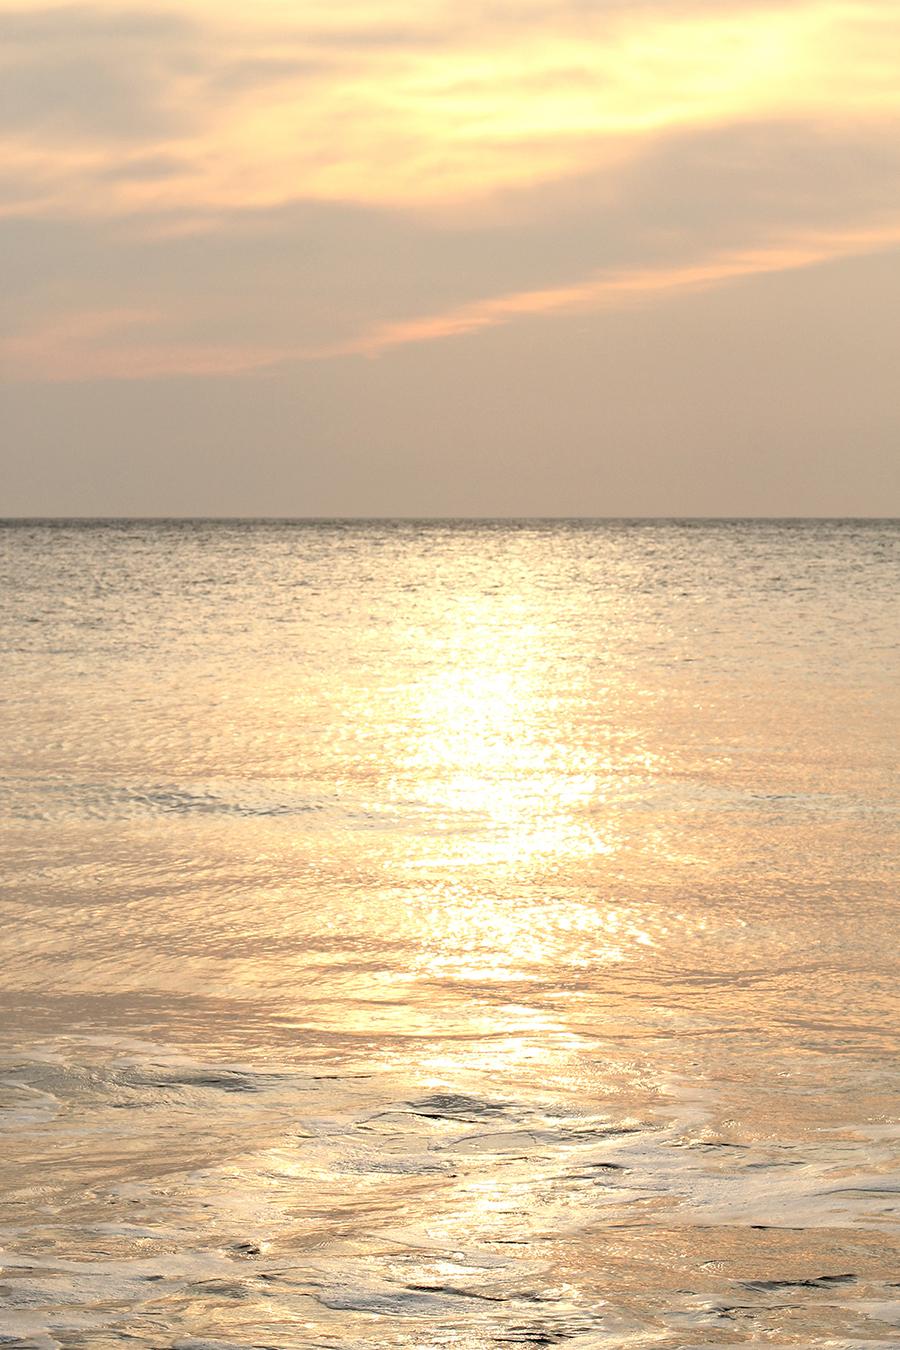 Beach for caitlyn rose gold 2.jpg